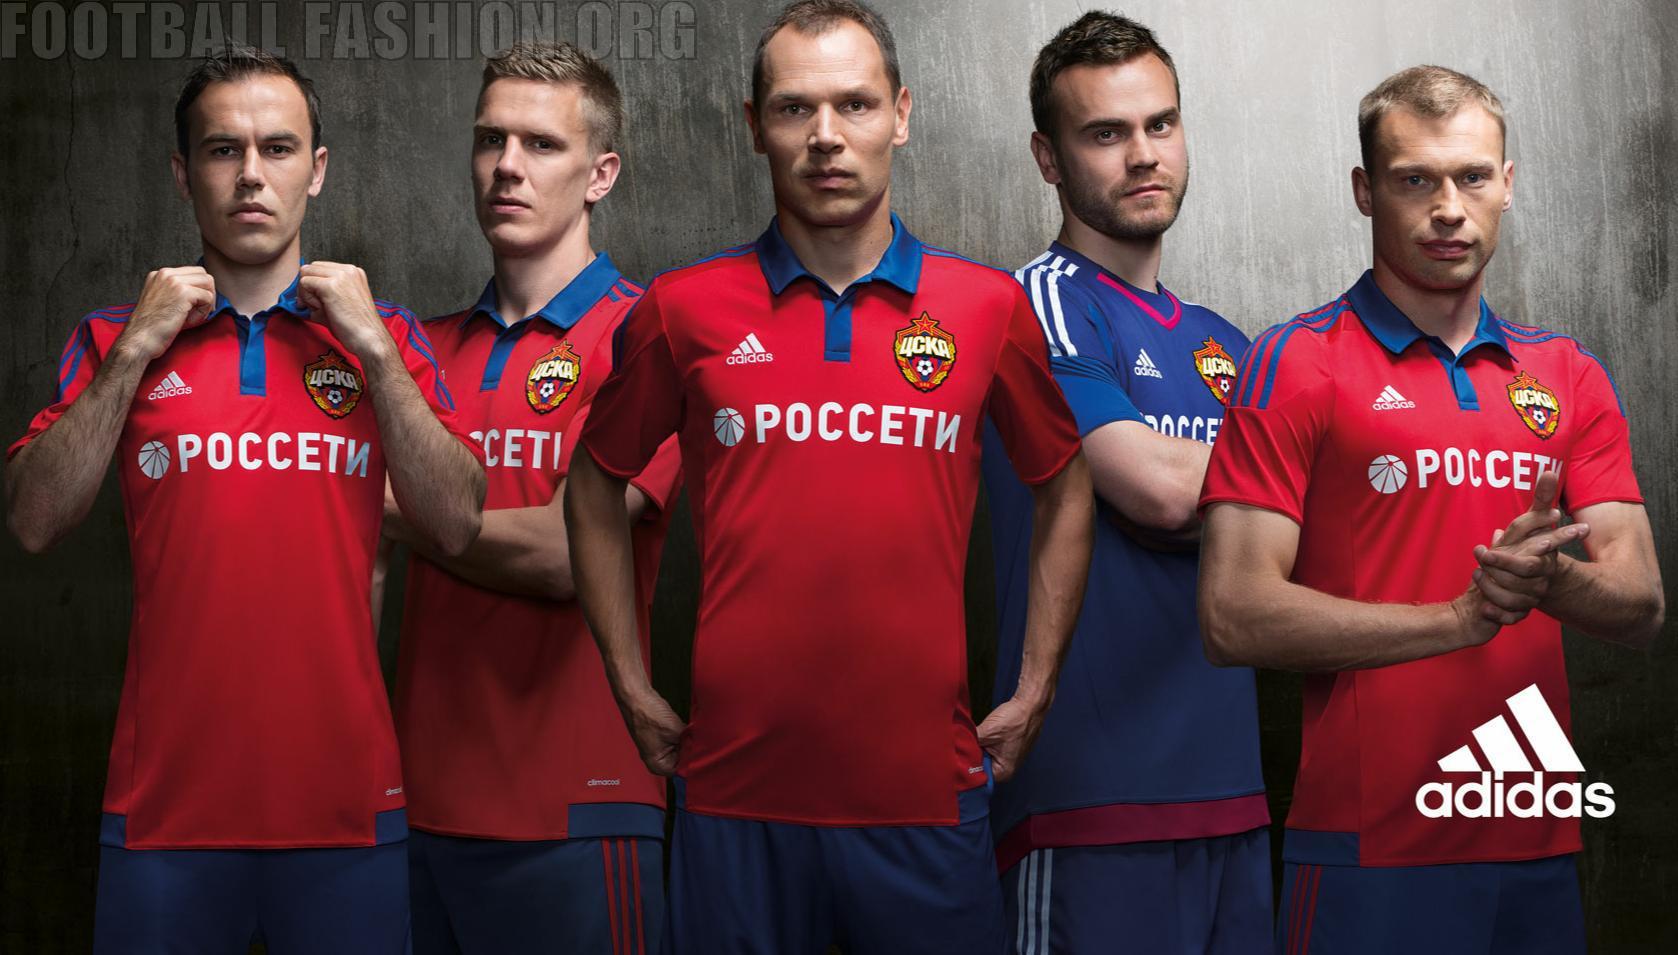 cska-moscow-2015-2016-adidas-kit-6